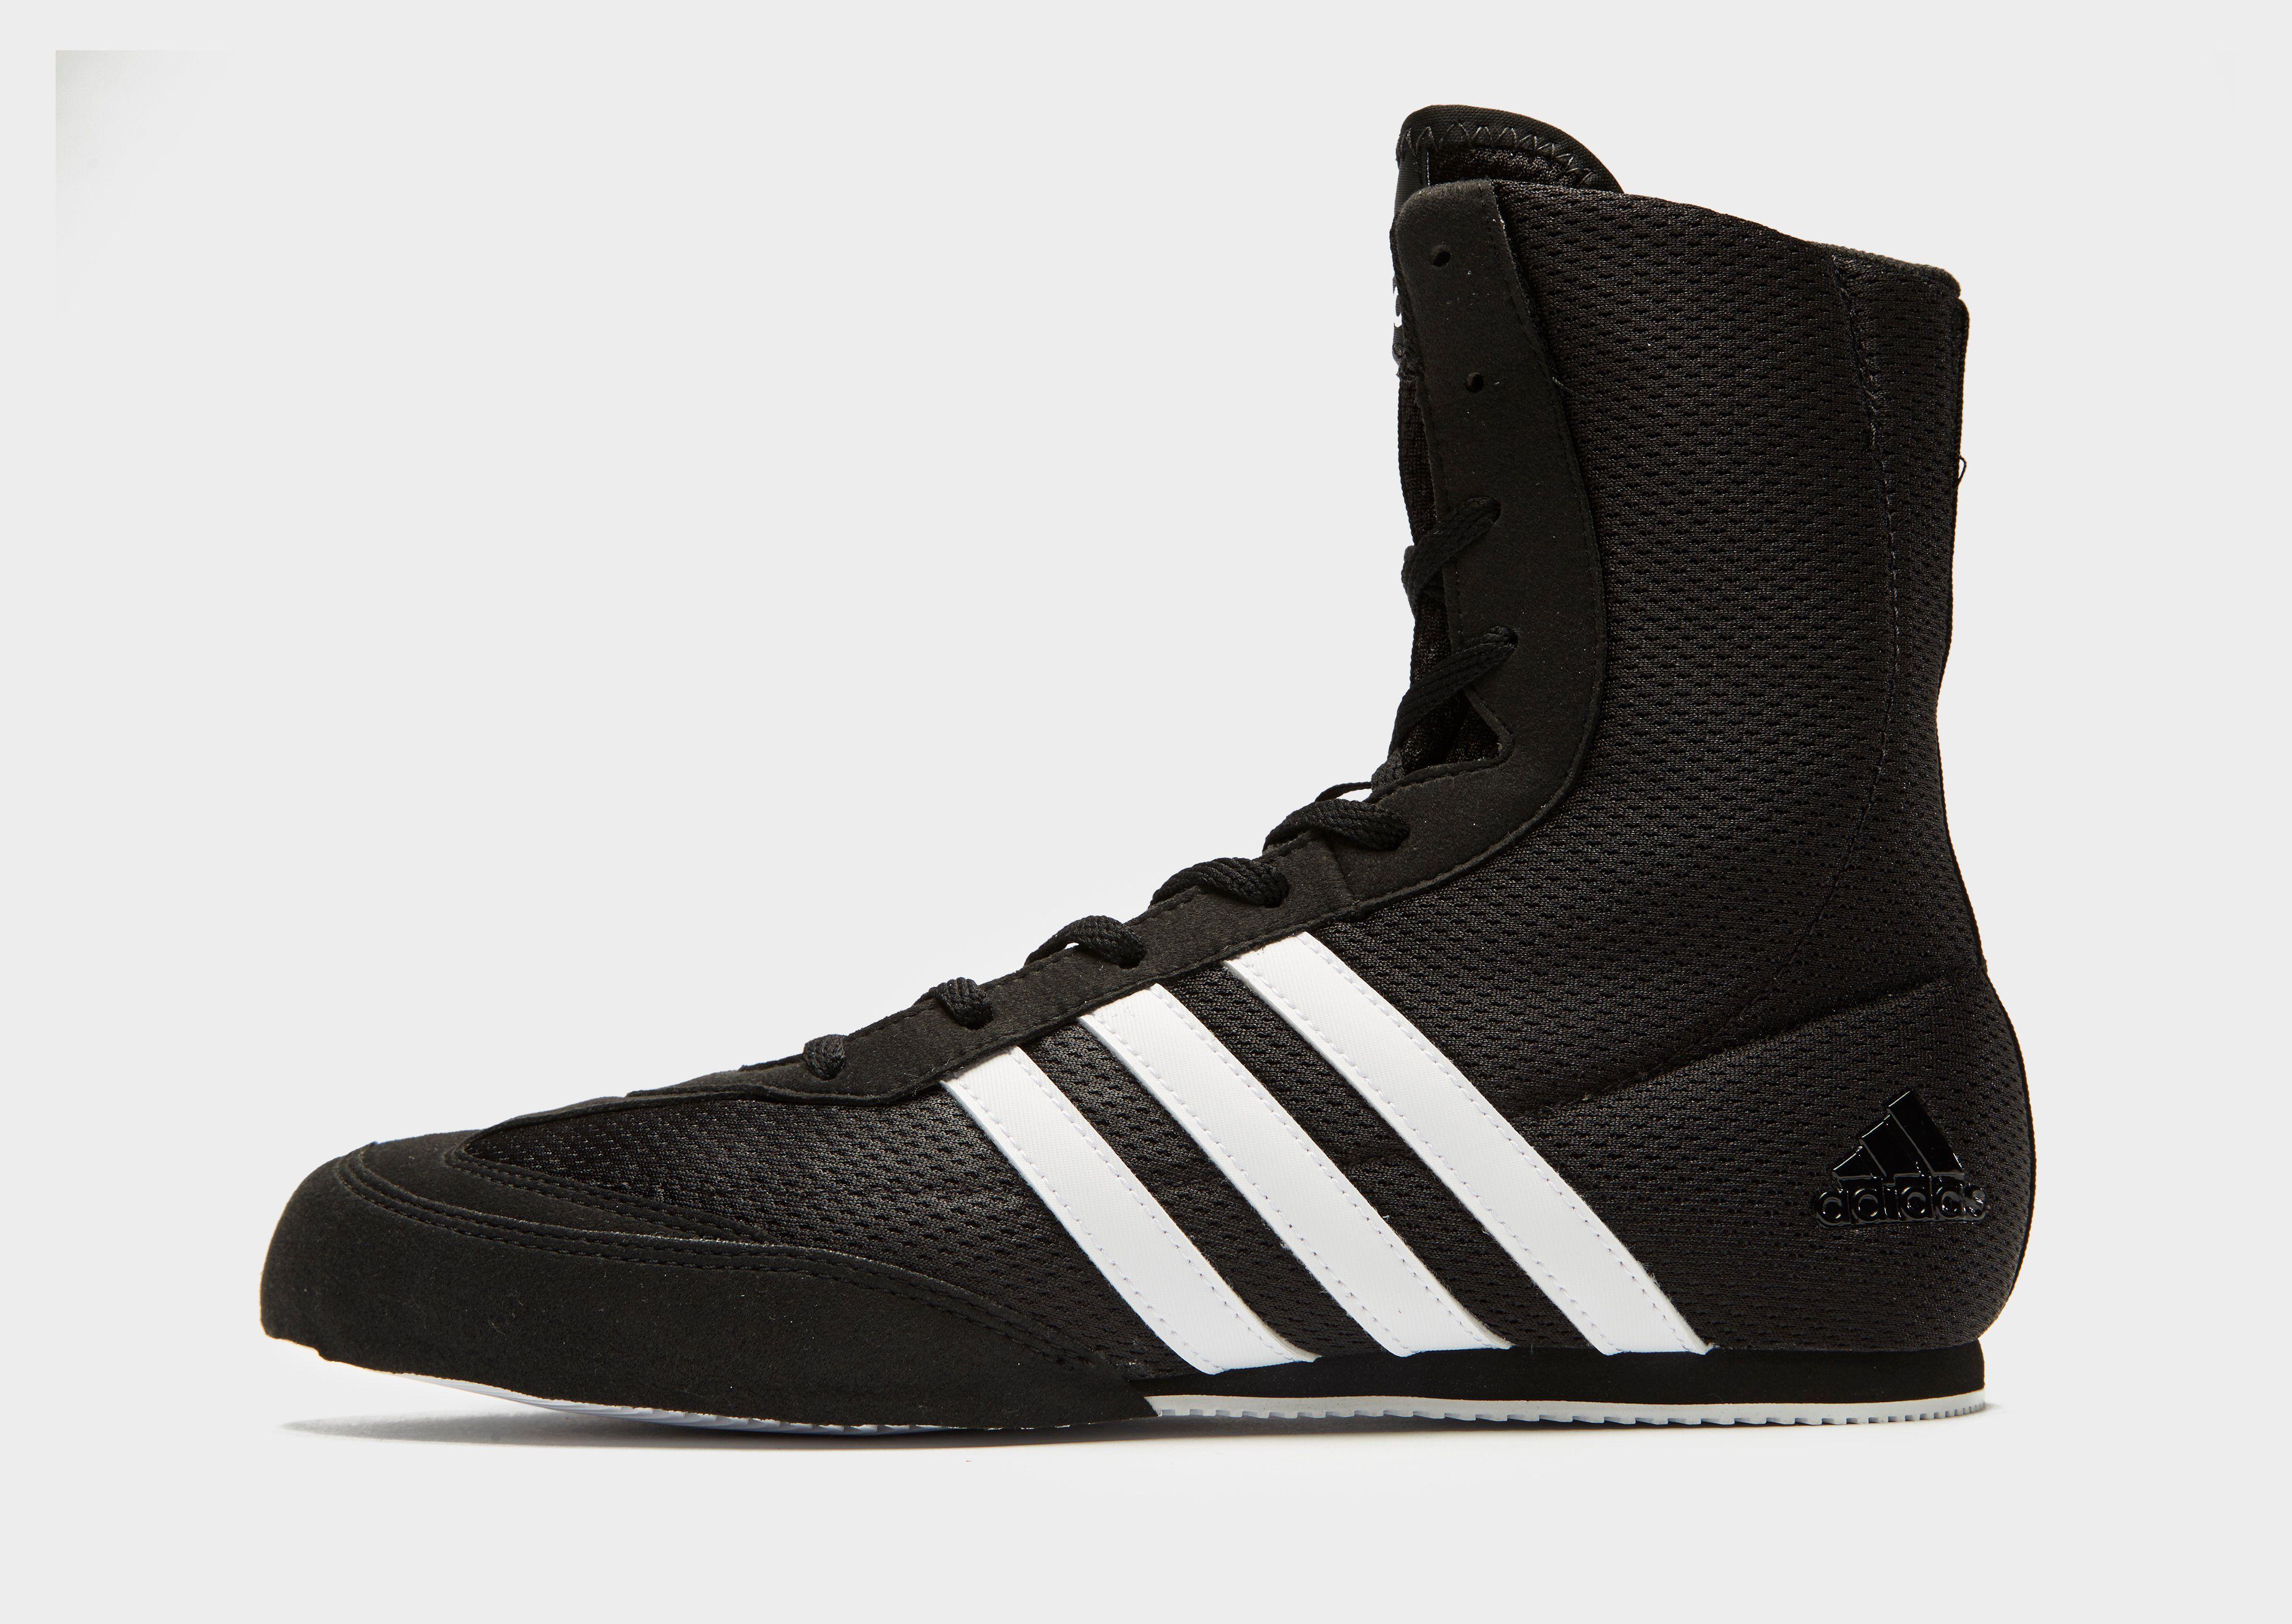 0e95d76cafe adidas Box Hog Boxing Boots